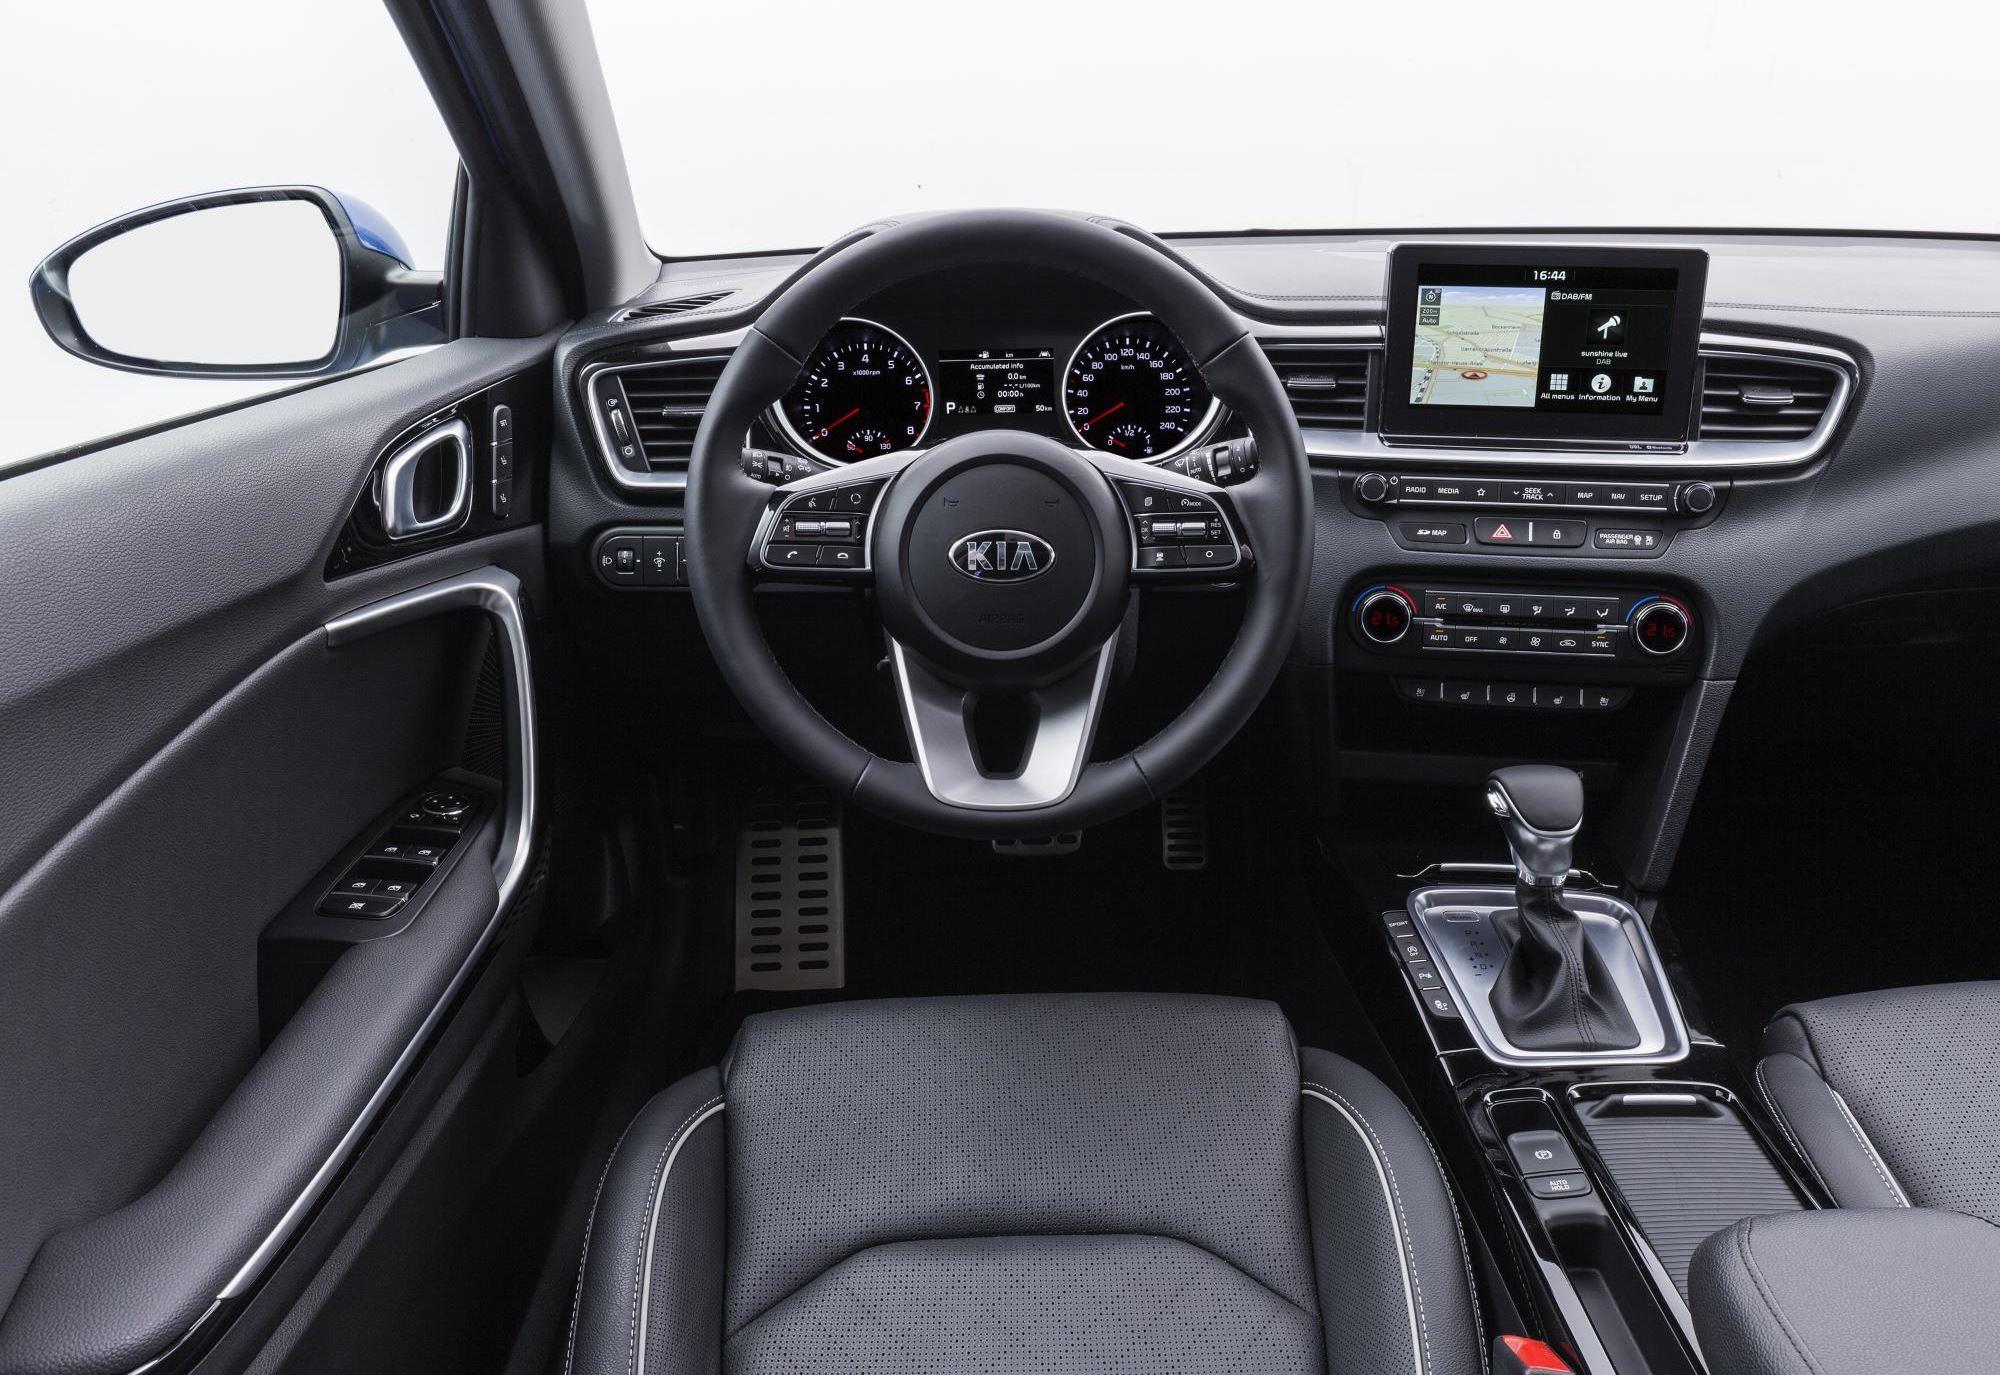 Kia Ceed Interior 0010.jpg